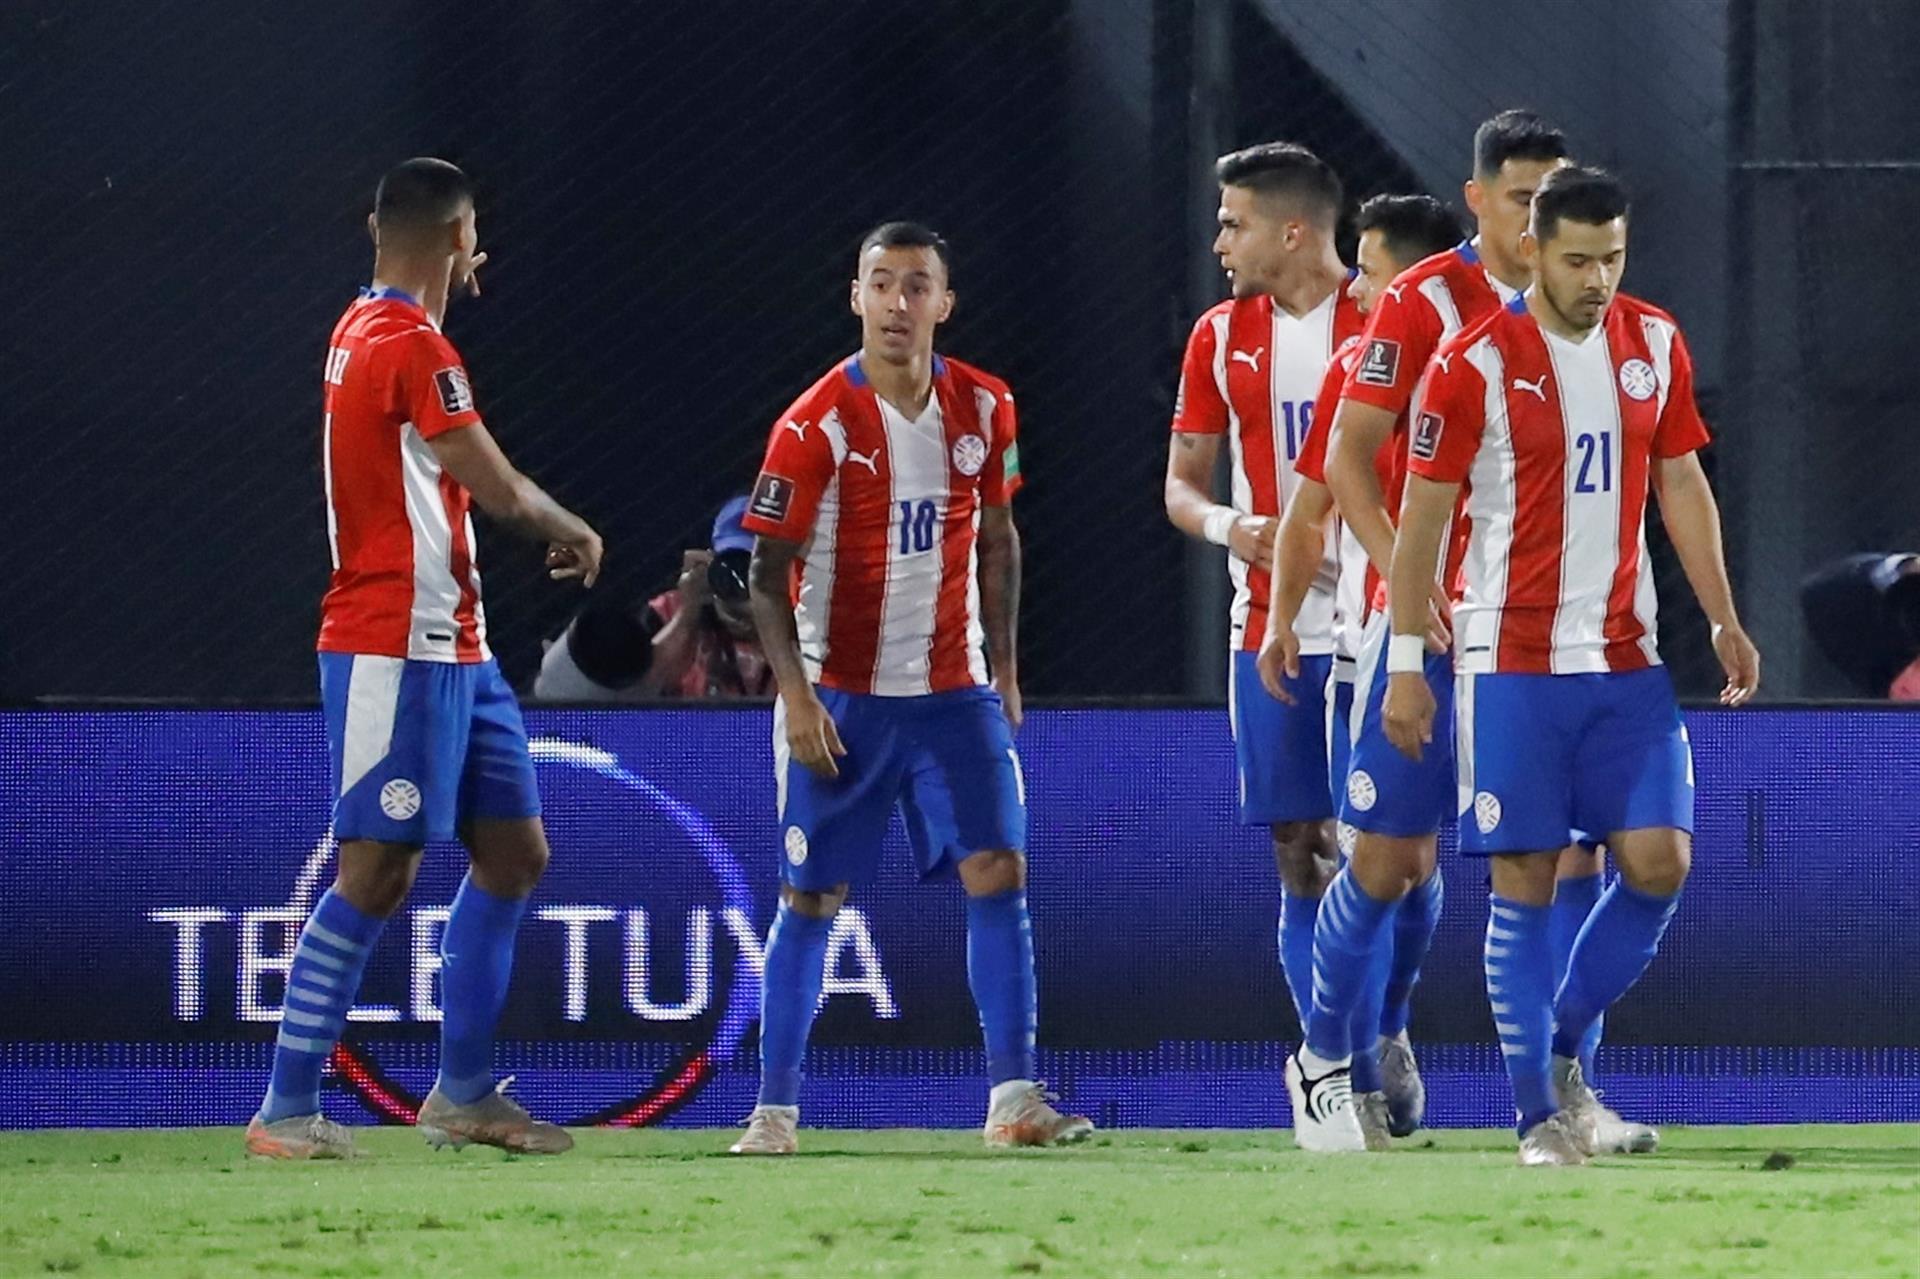 Paraguay vs Venezuela 2-1 Jornada 9 Eliminatorias CONMEBOL 2022